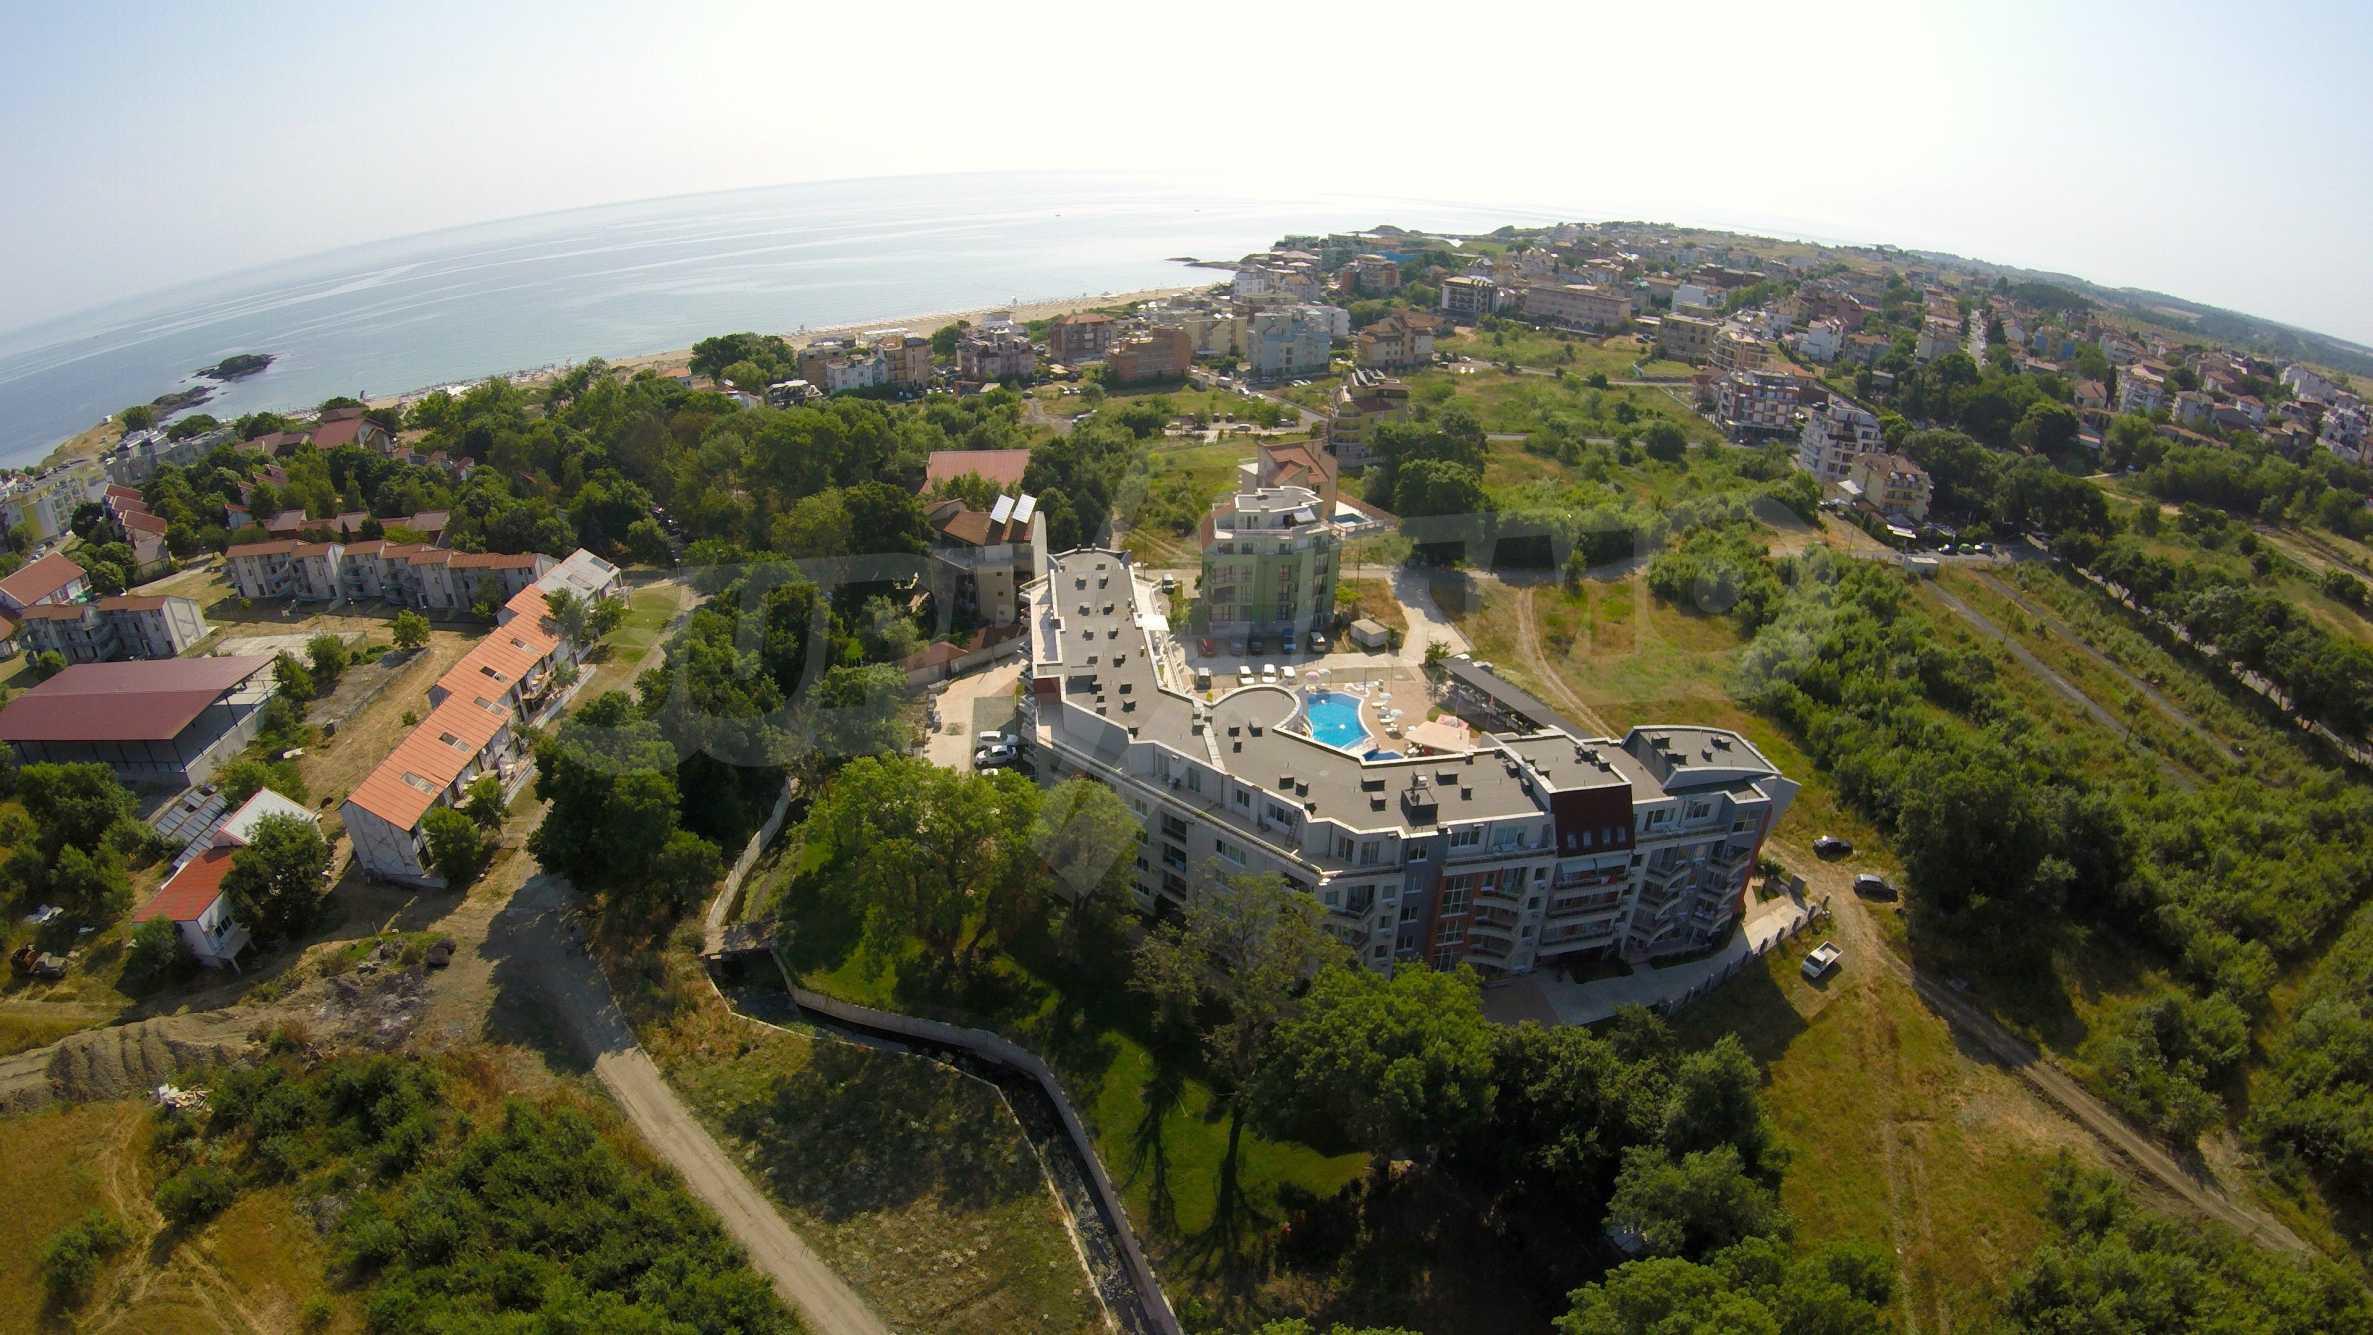 Трехкомнатный апартамент на продажу в комплексе Emberli в курорте Лозенец 30